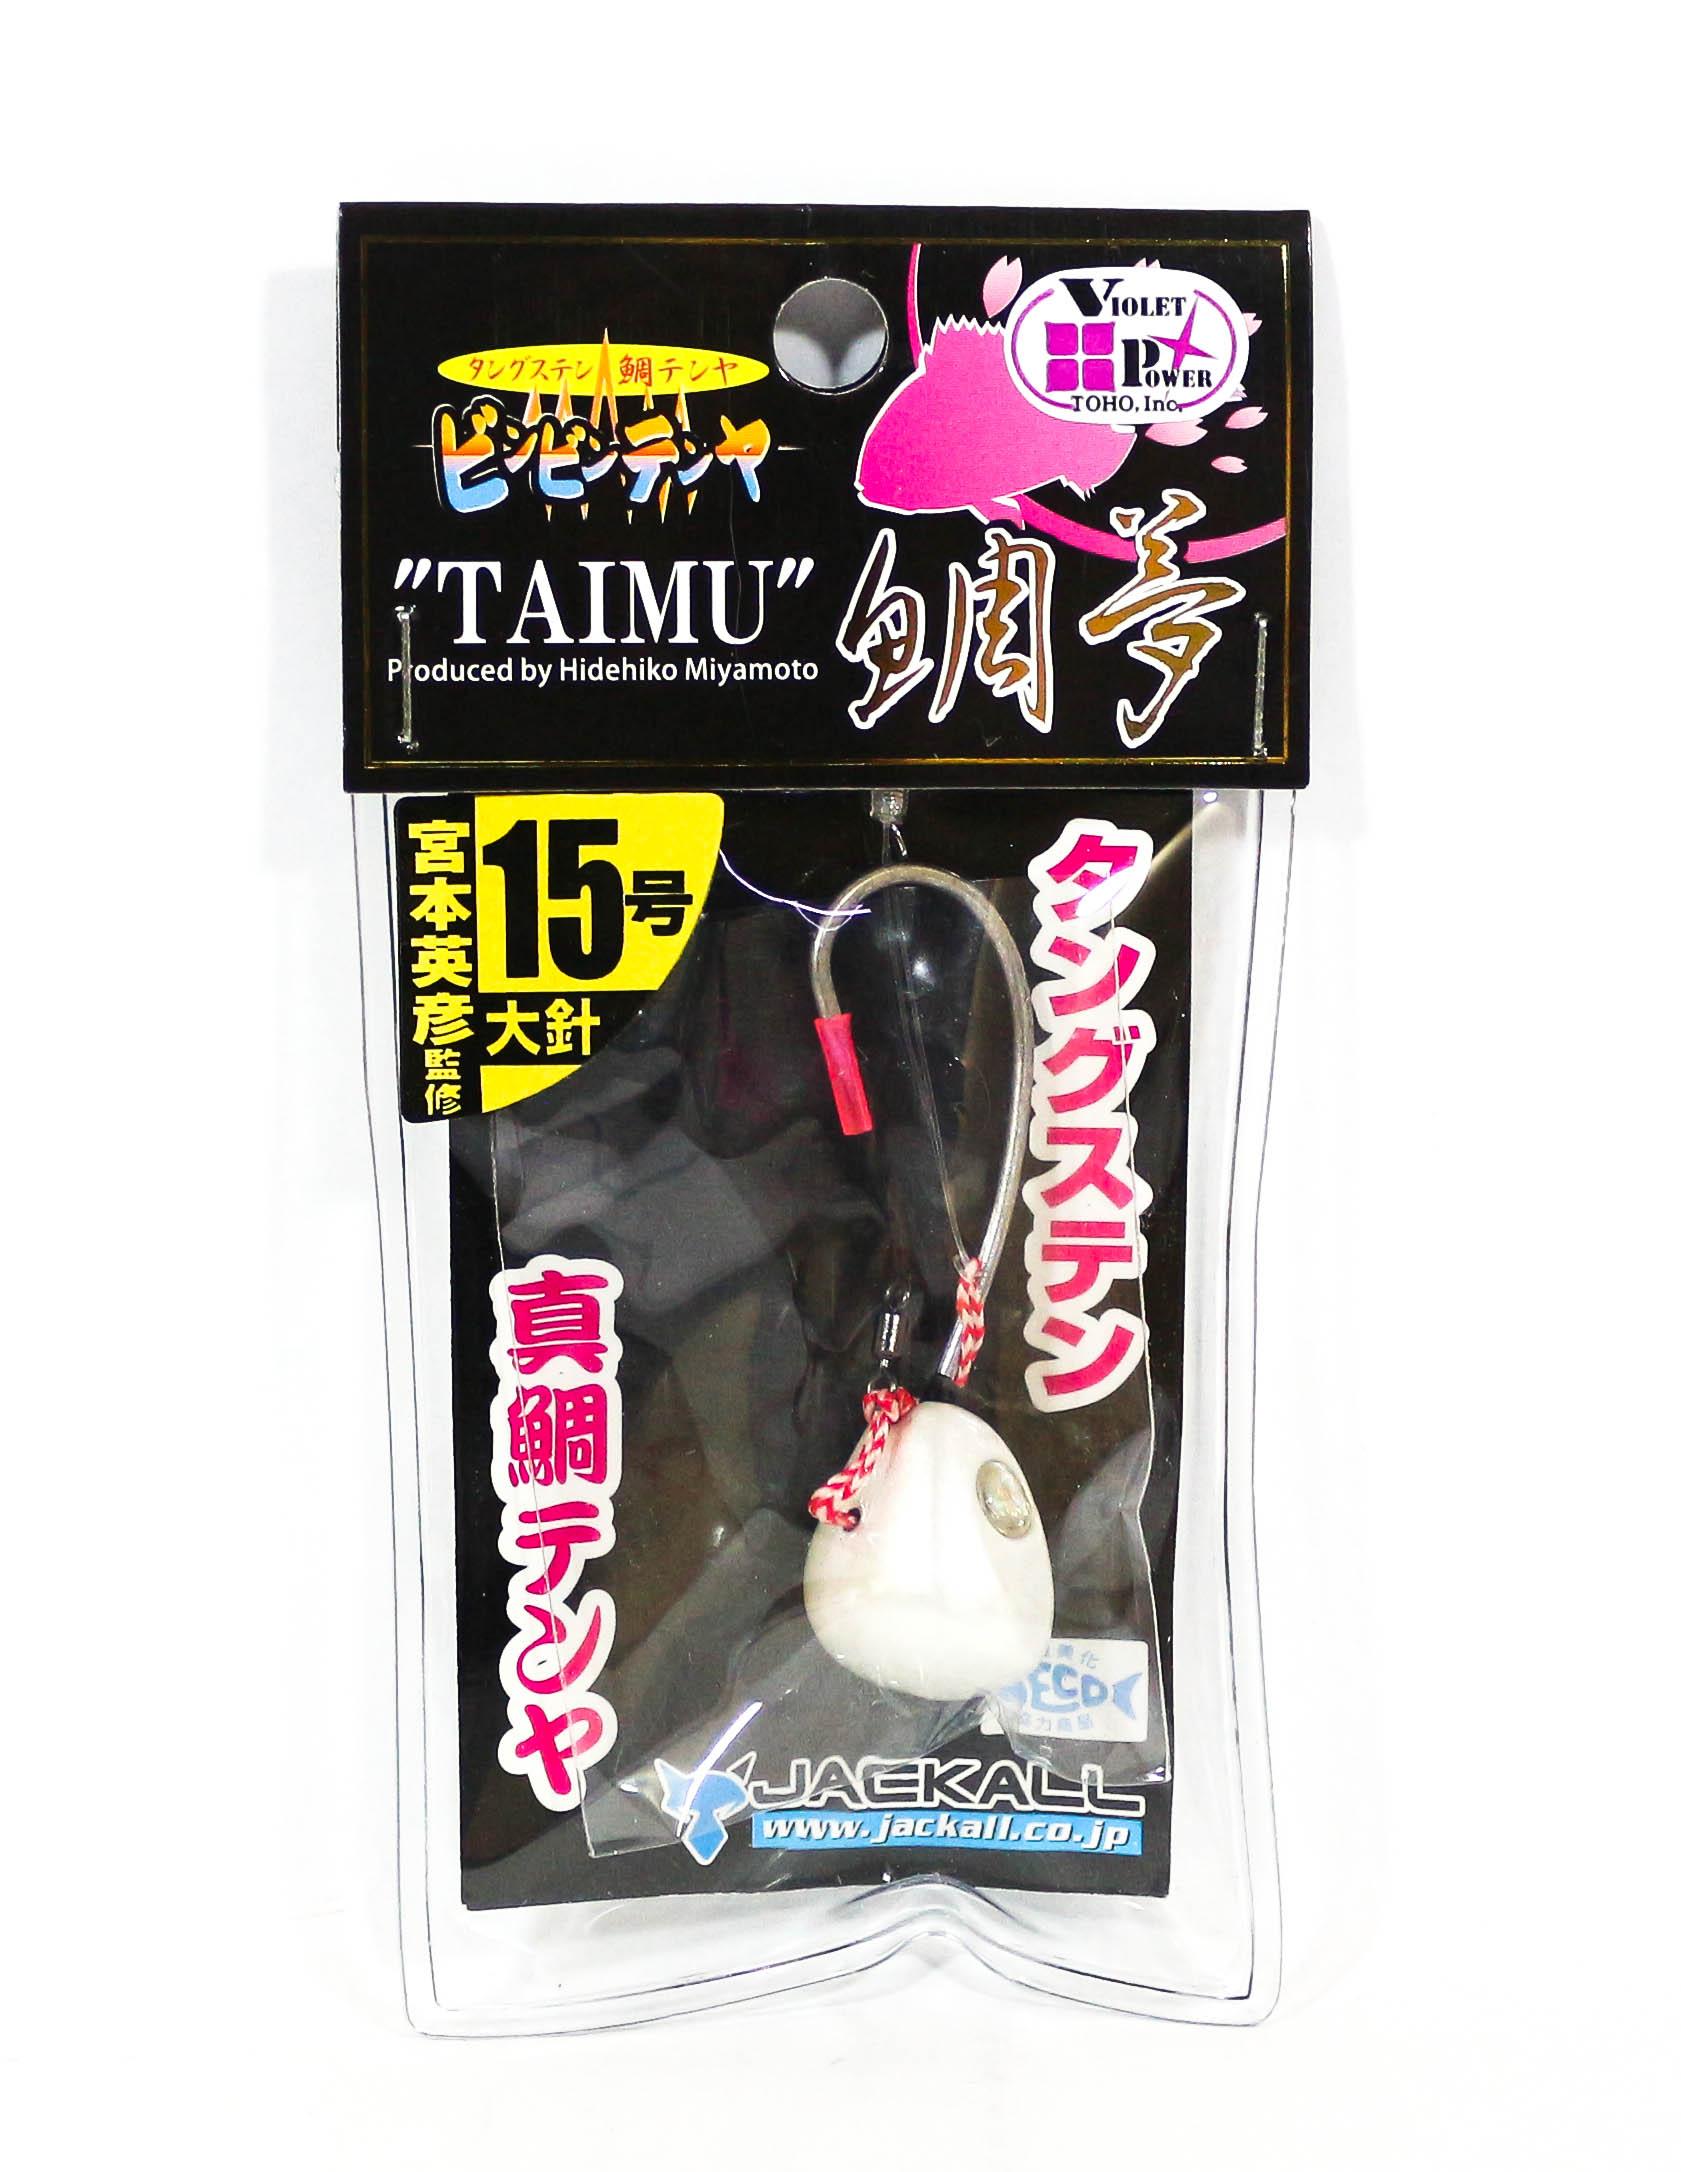 Jackall Bin Bin Tenya Taimu No. 15 L Super White (8398)